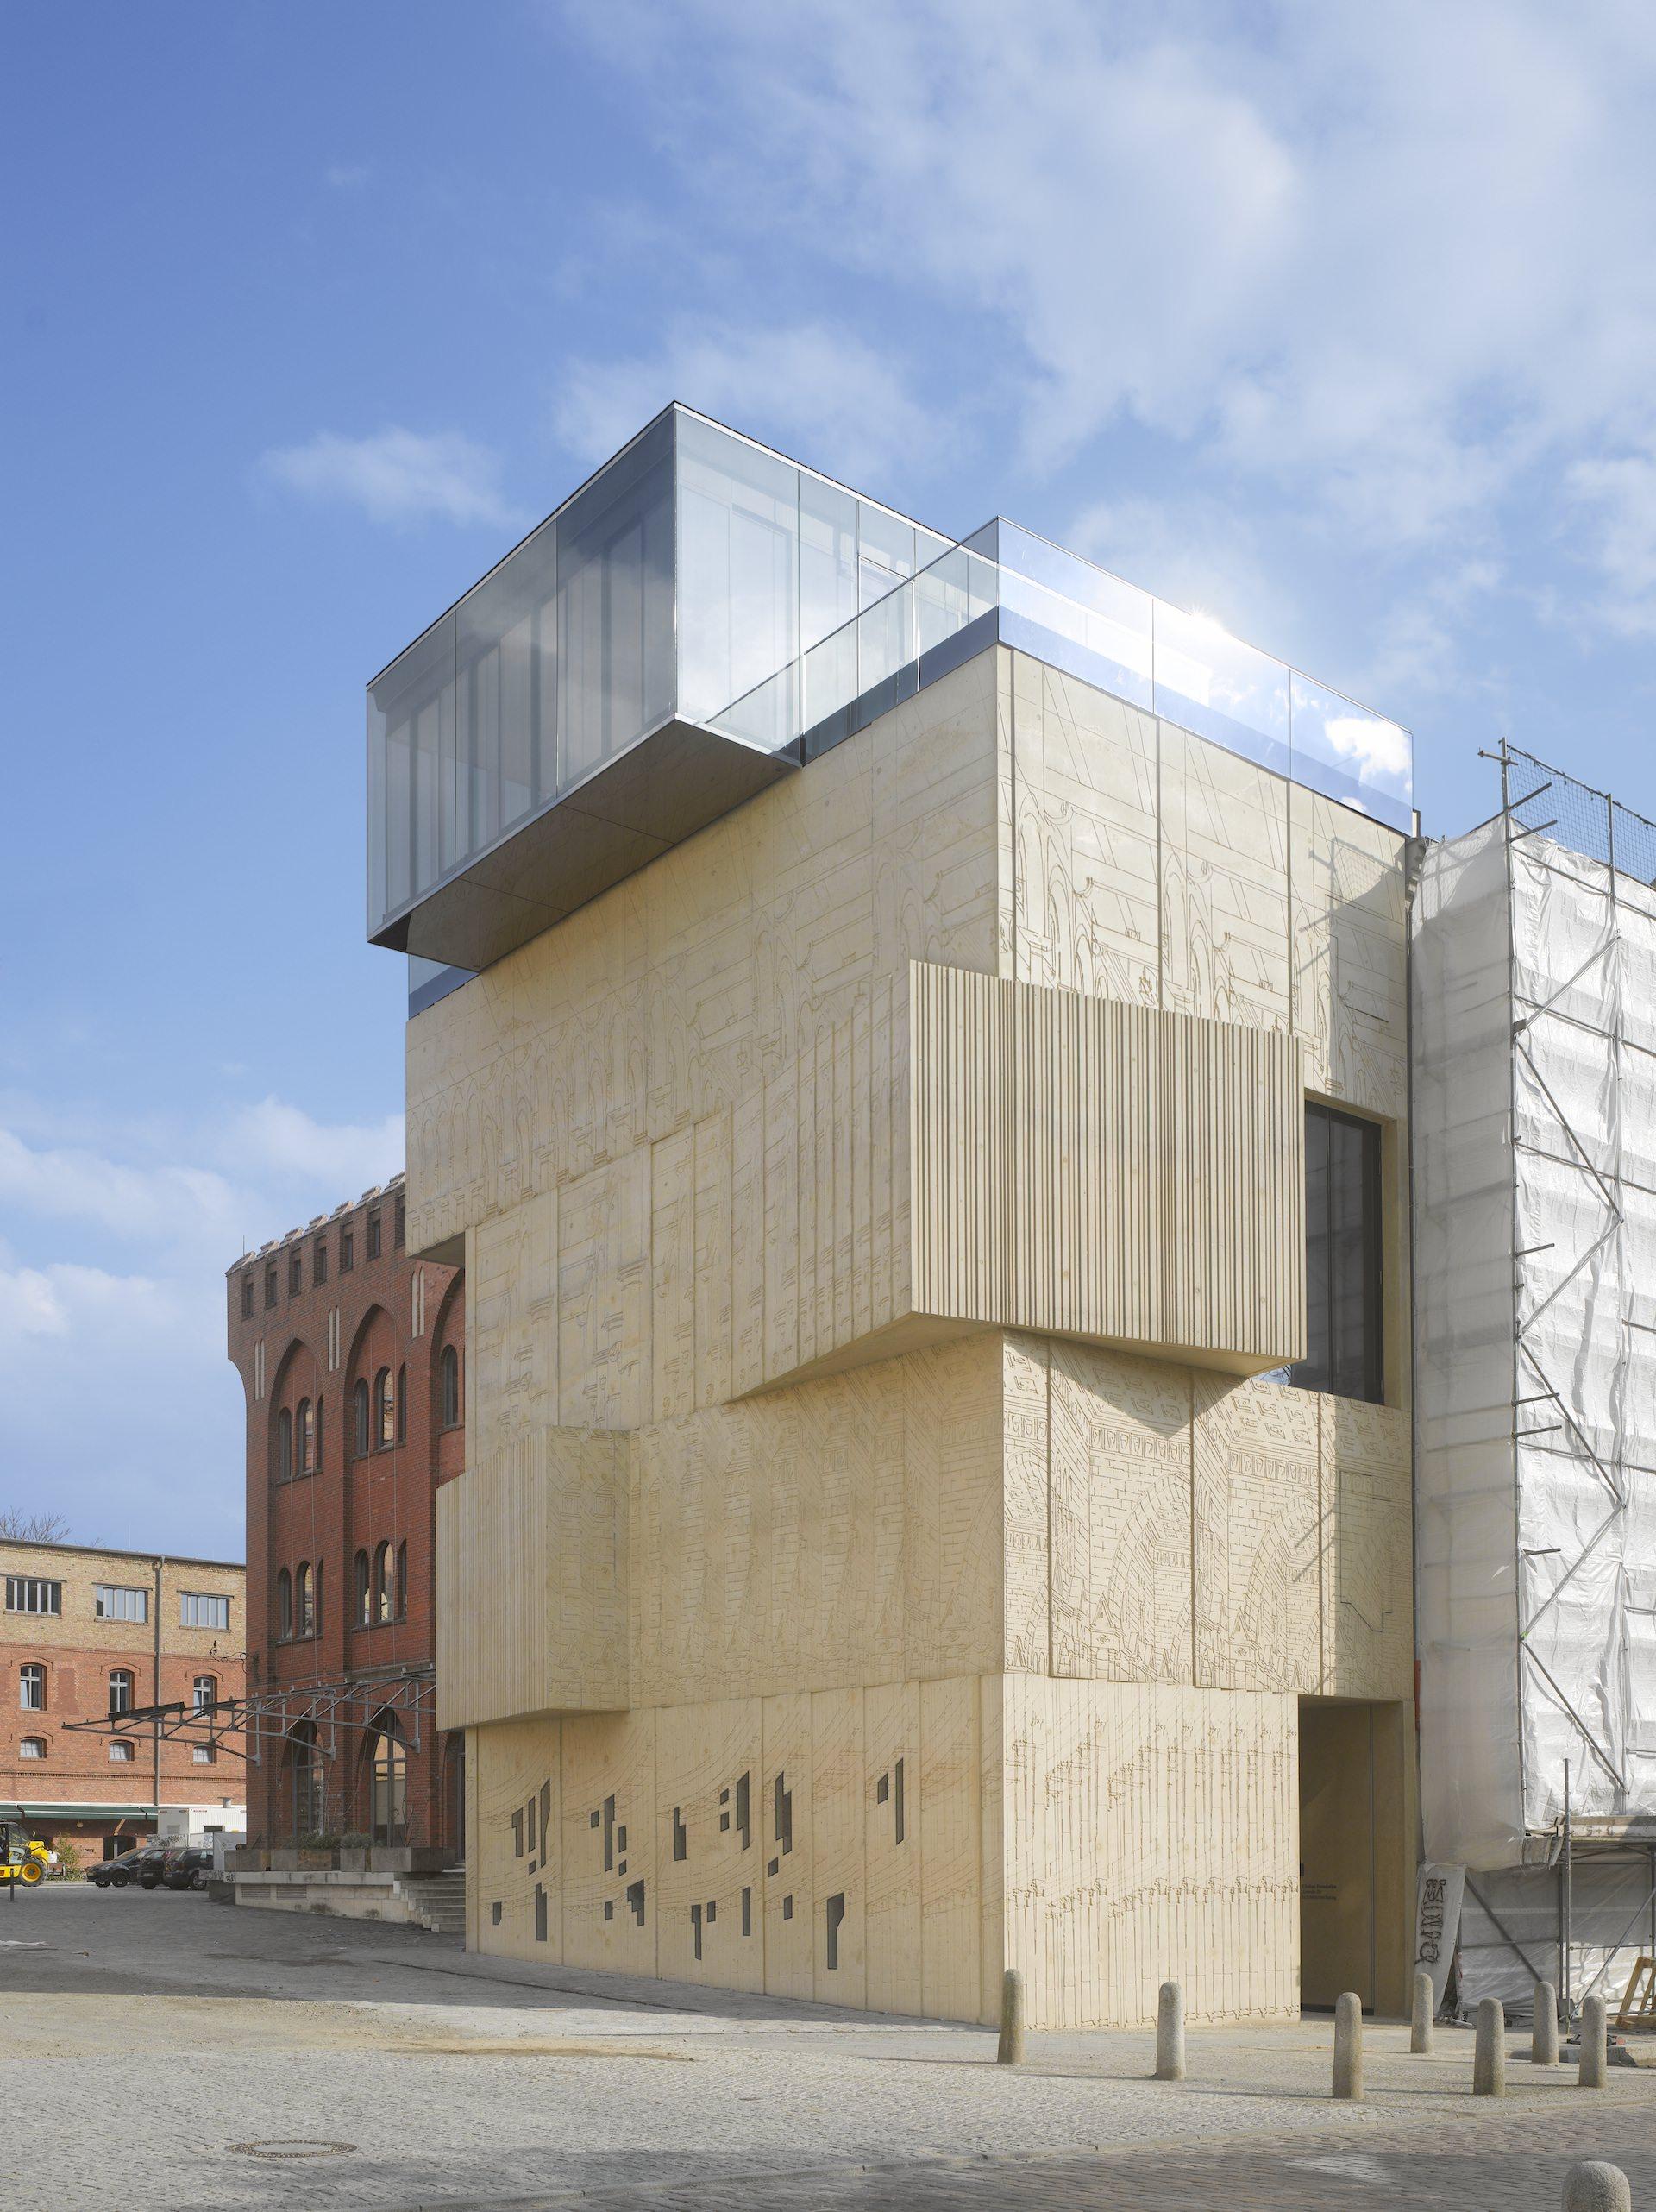 Piranesi exhibition at the tchoban foundation uncube for Architektur master berlin